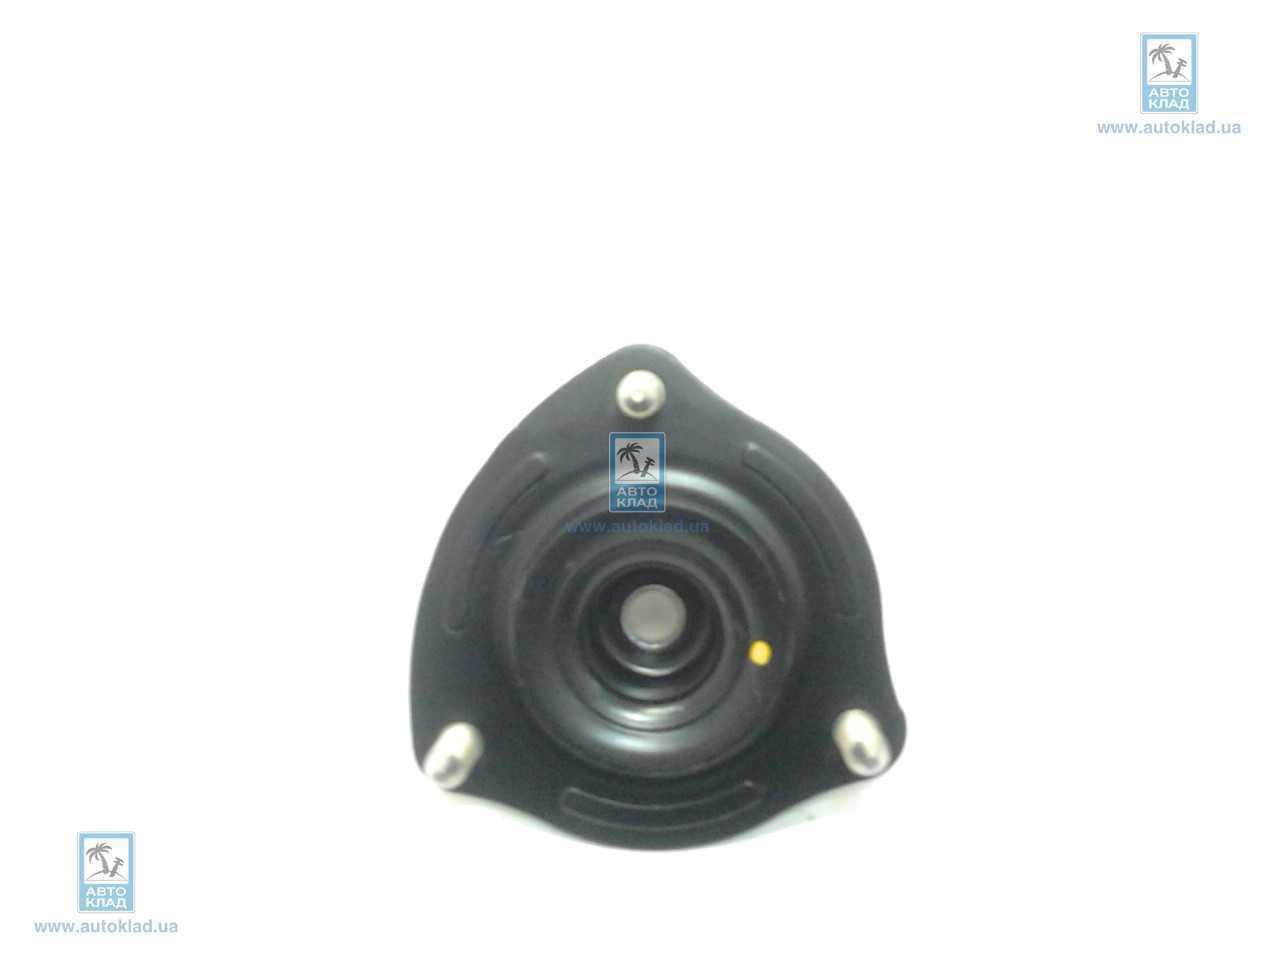 Опора амортизатора HONDA 51920-SVB-A03